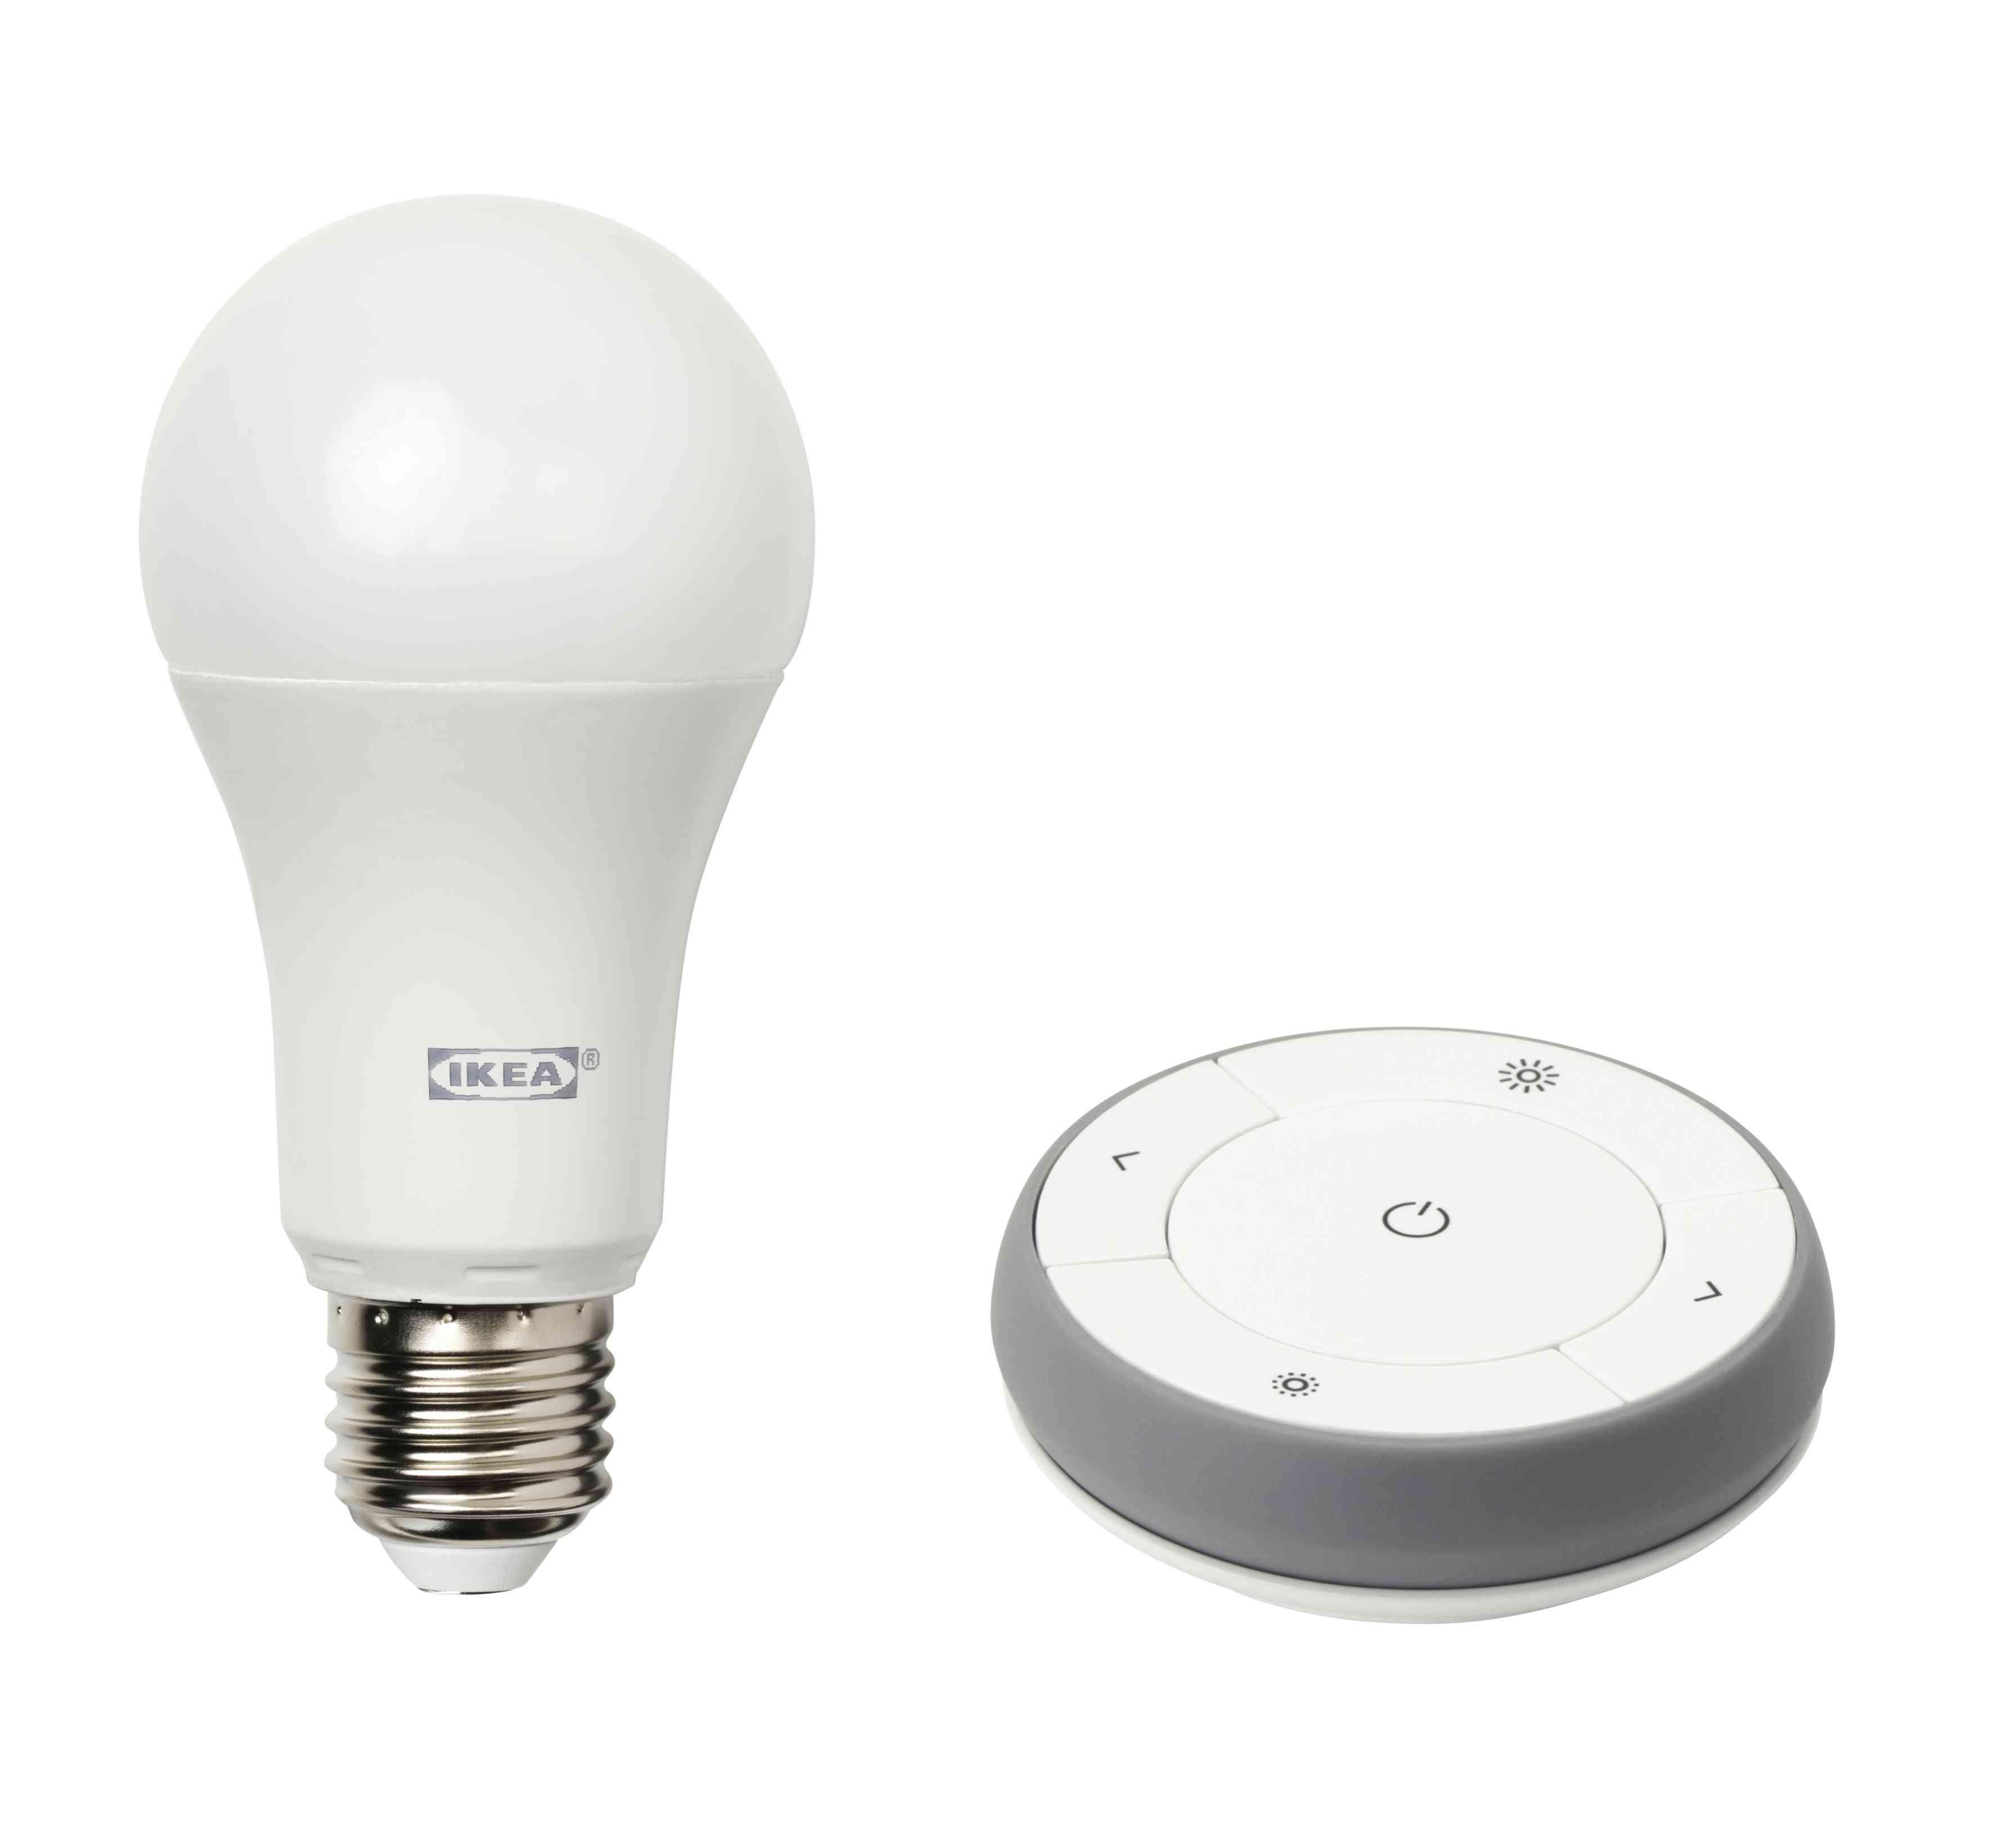 Novedades en iluminación de casas inteligentes con IKEA 56